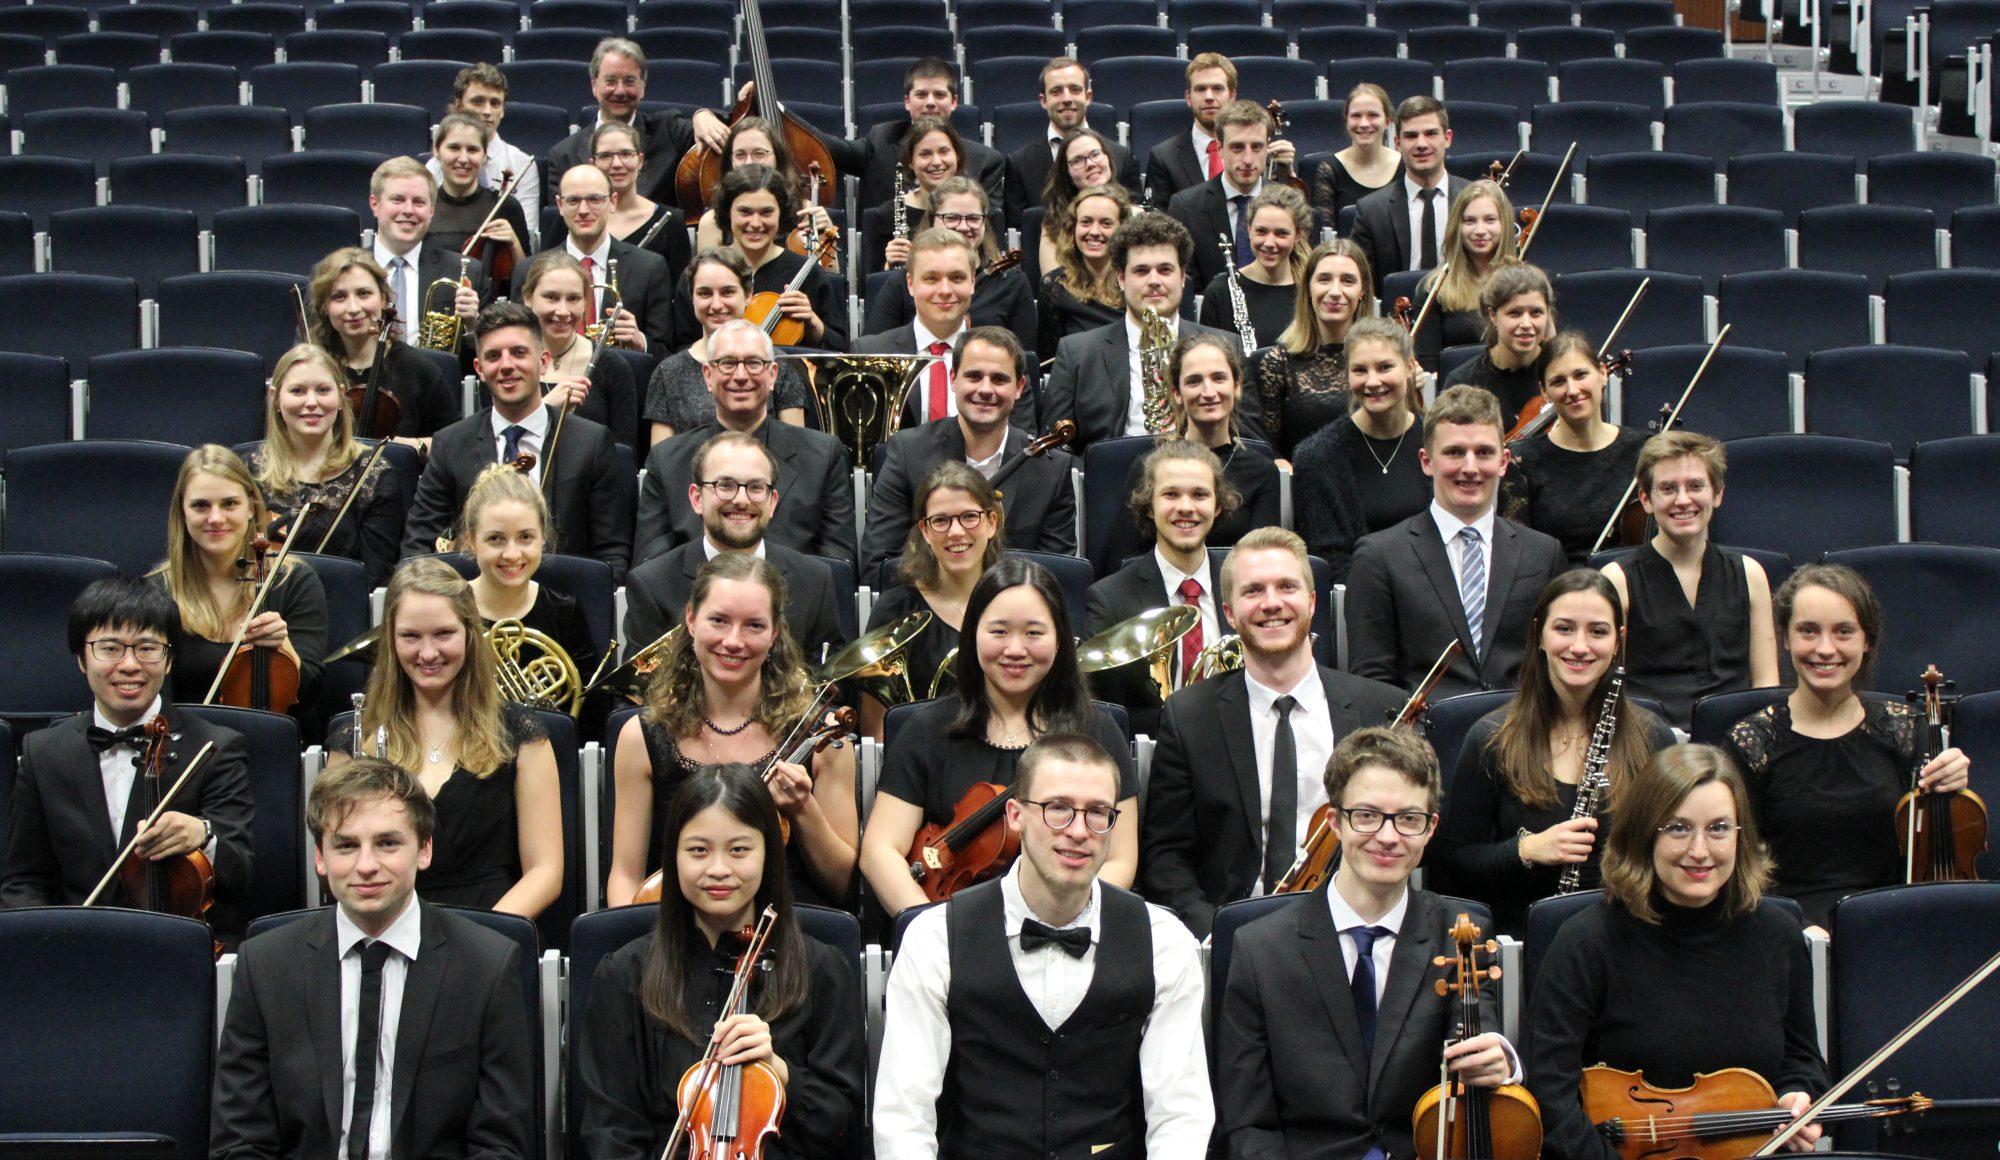 Studenten-Sinfonie Orchester Marburg e.V.